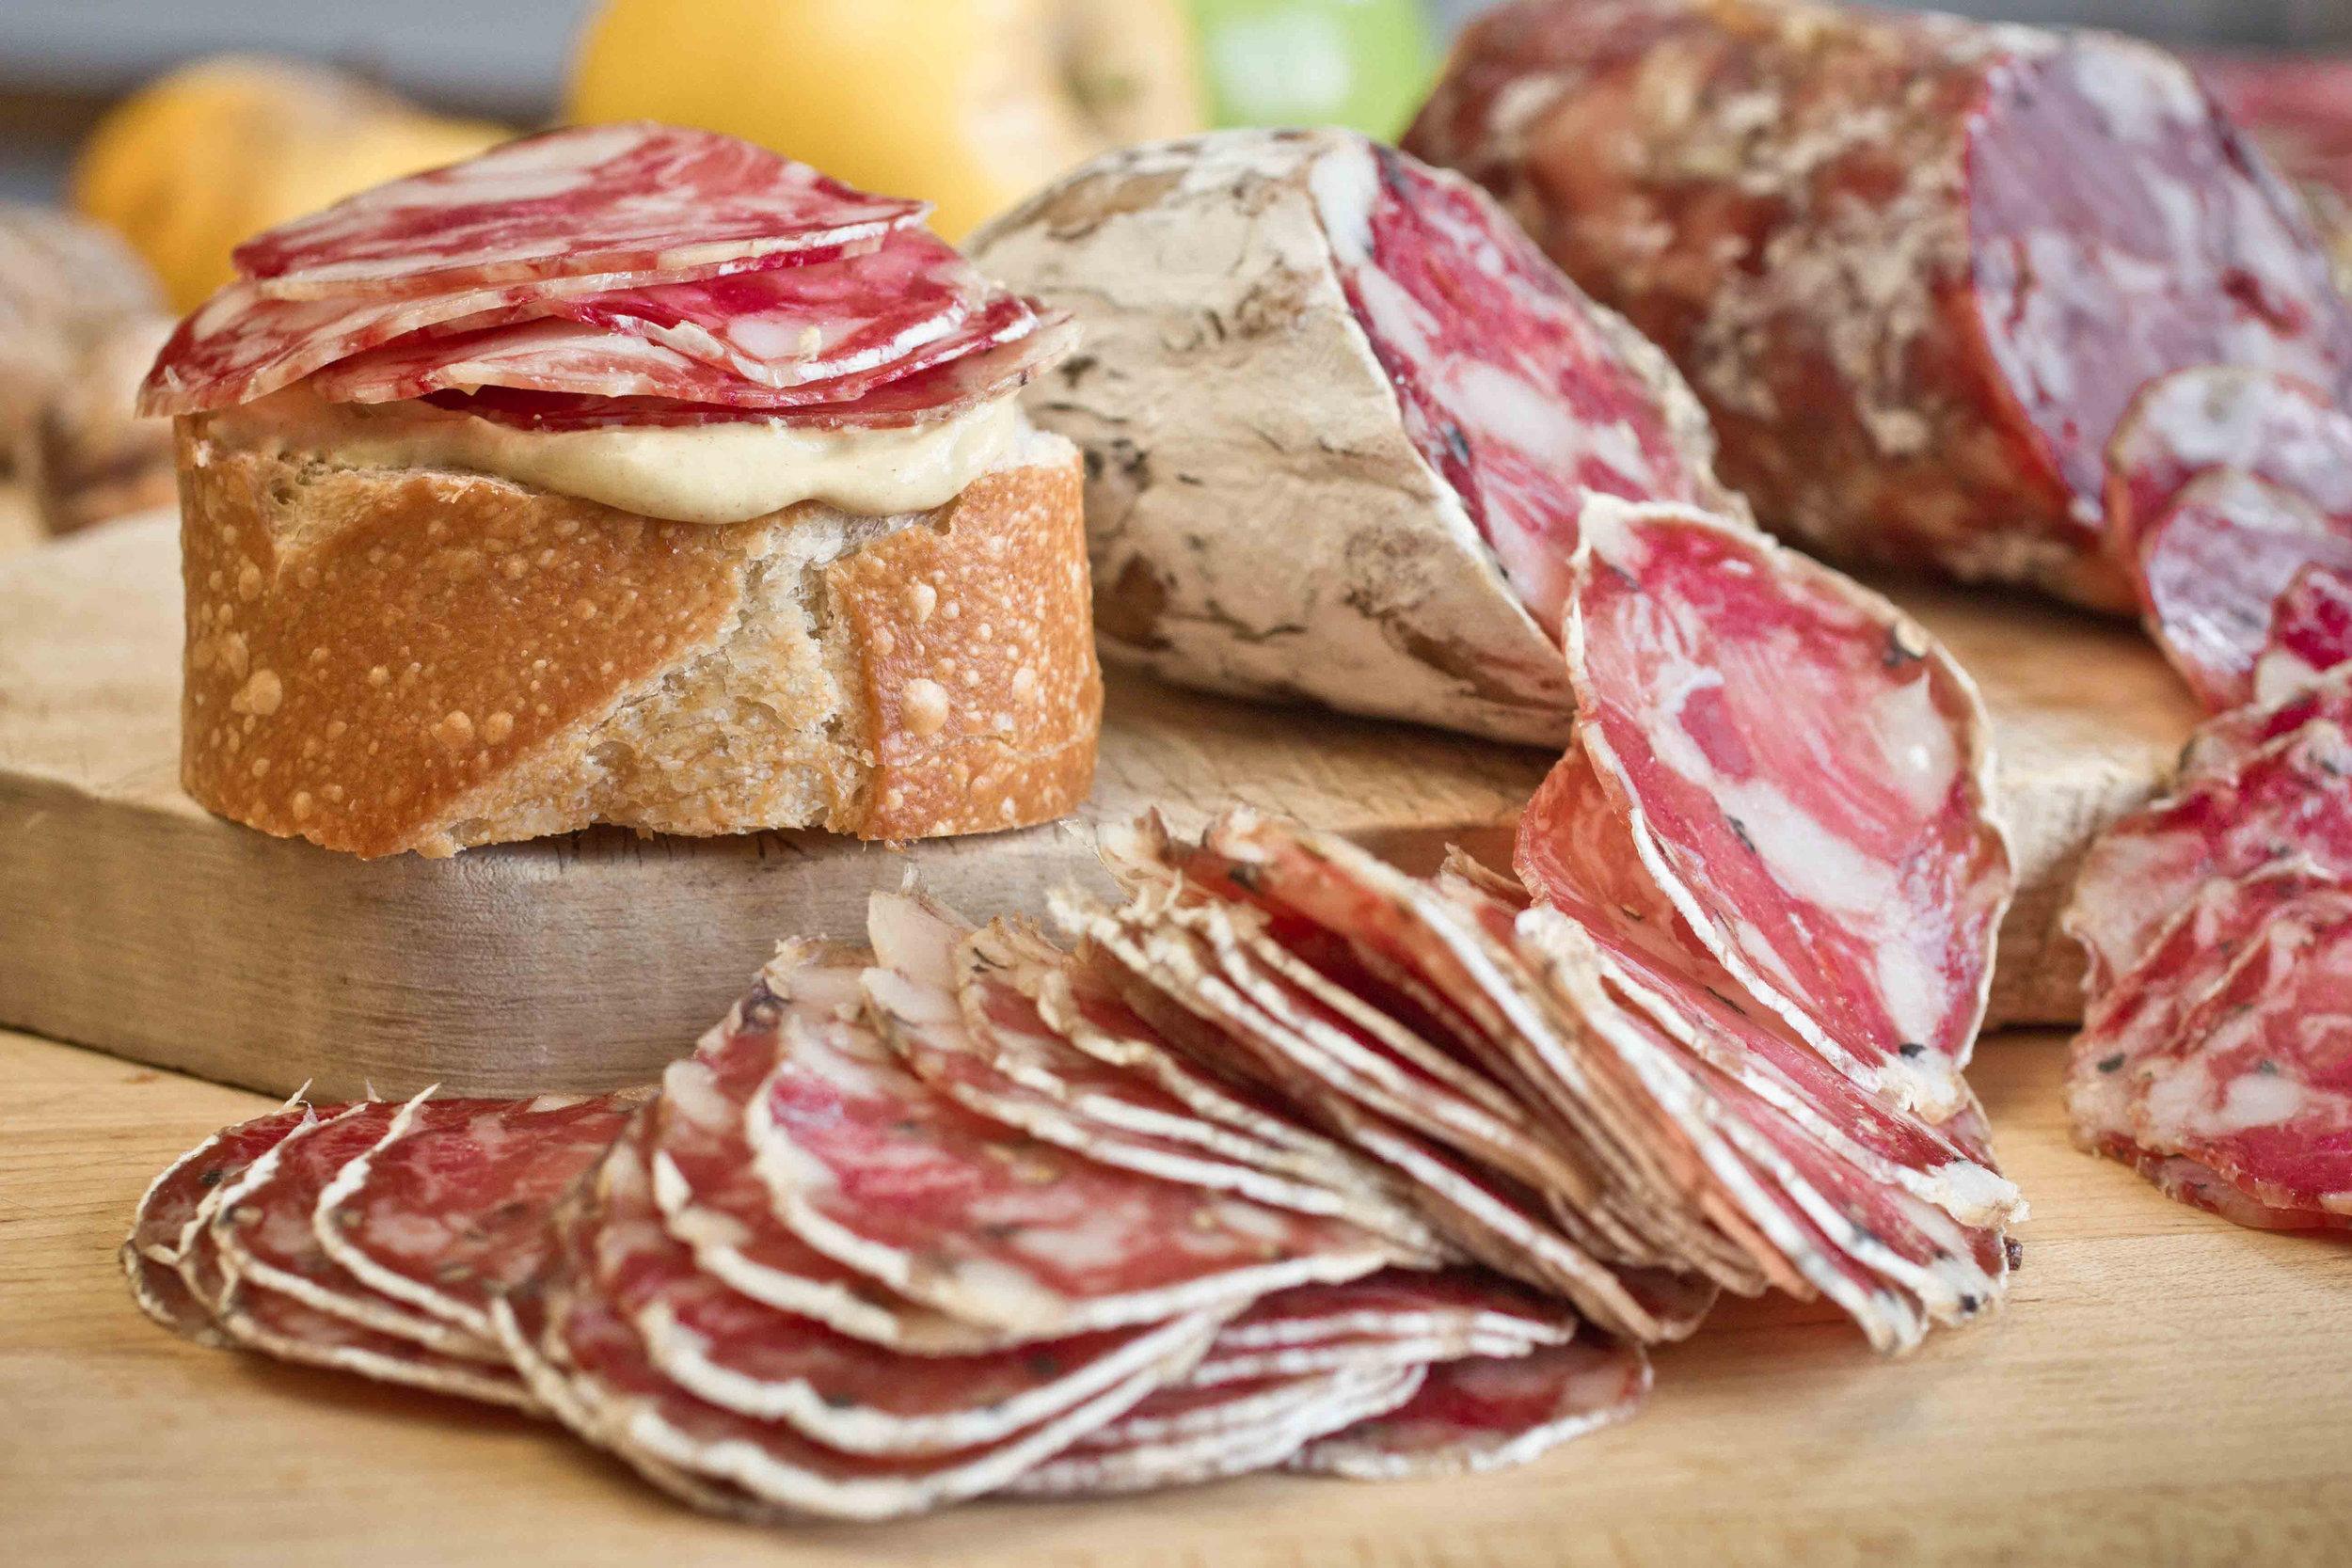 sausage-meats.jpg